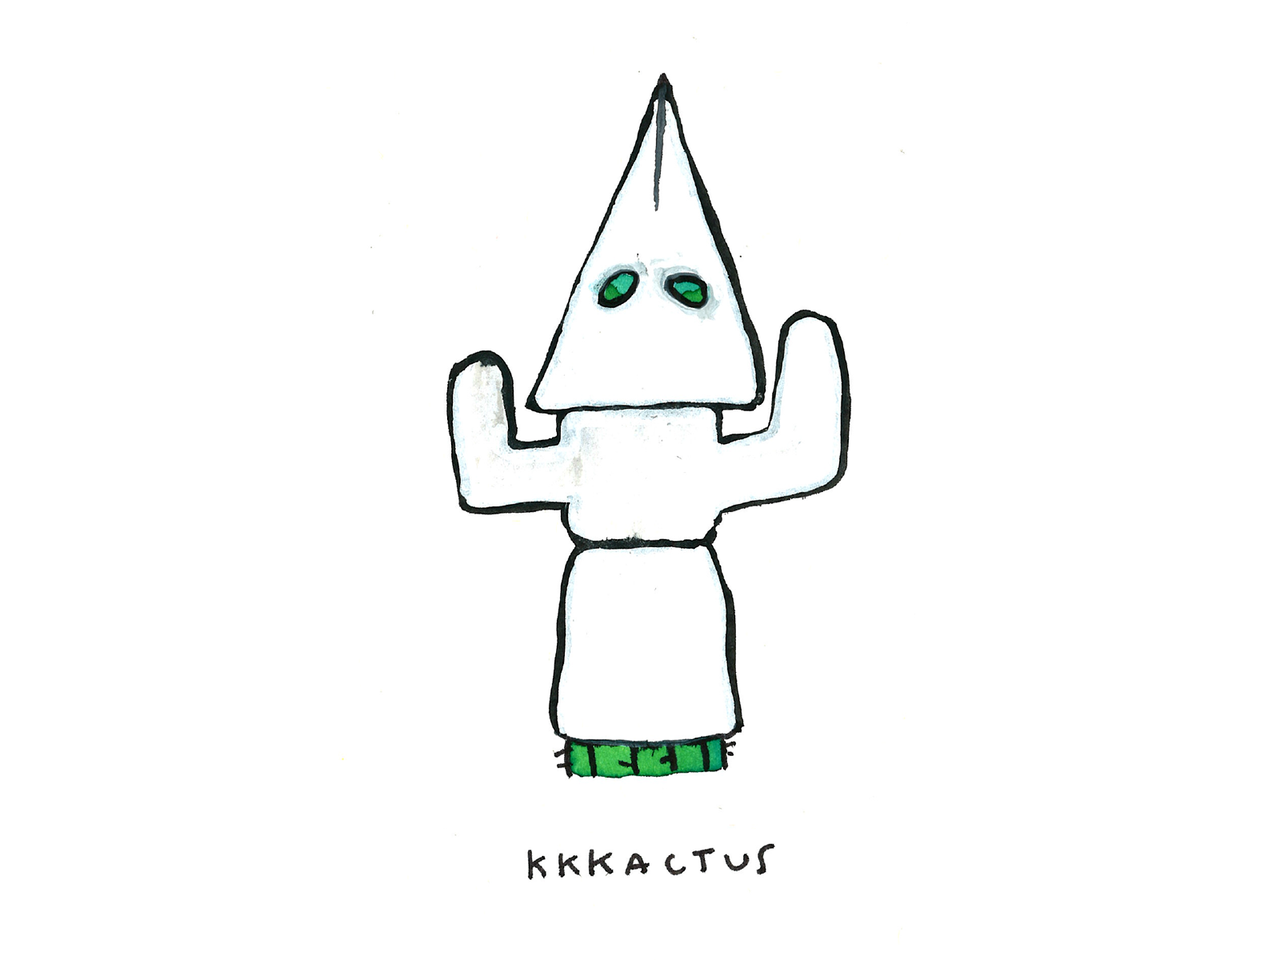 kkkactus